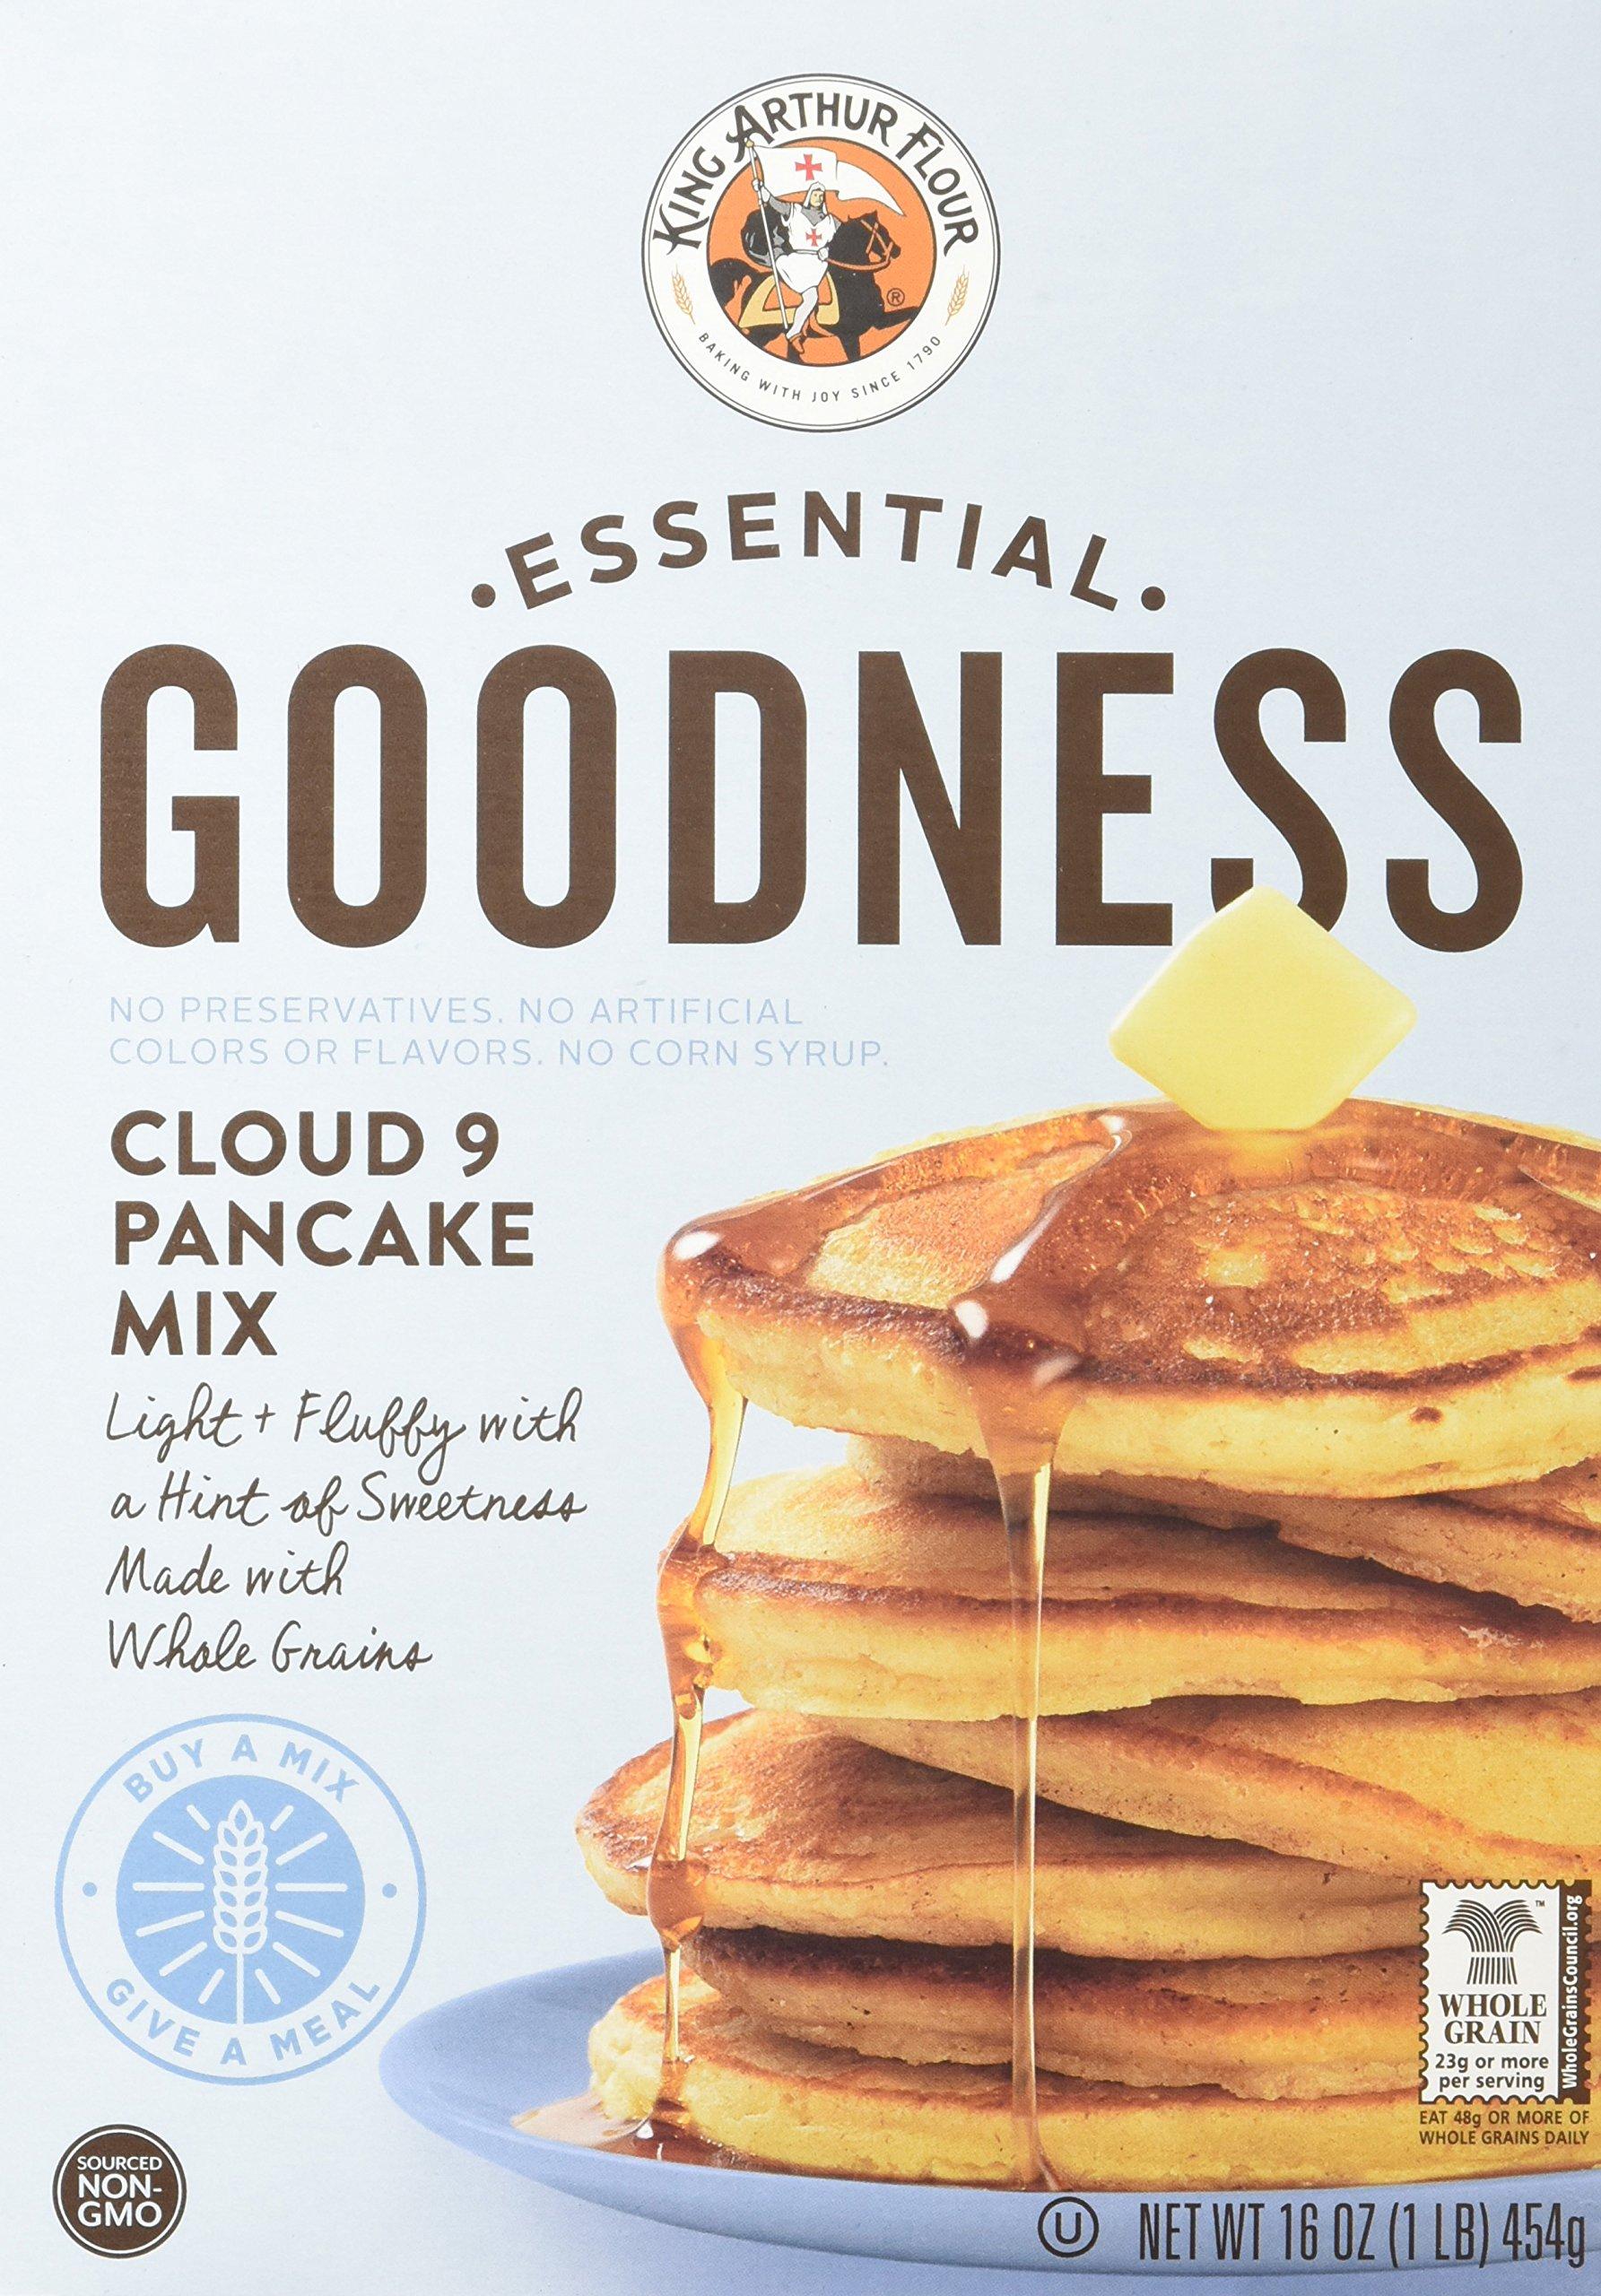 King Arthur Flour Essential Goodness Cloud 9 Pancake Mix, 16 Ounce